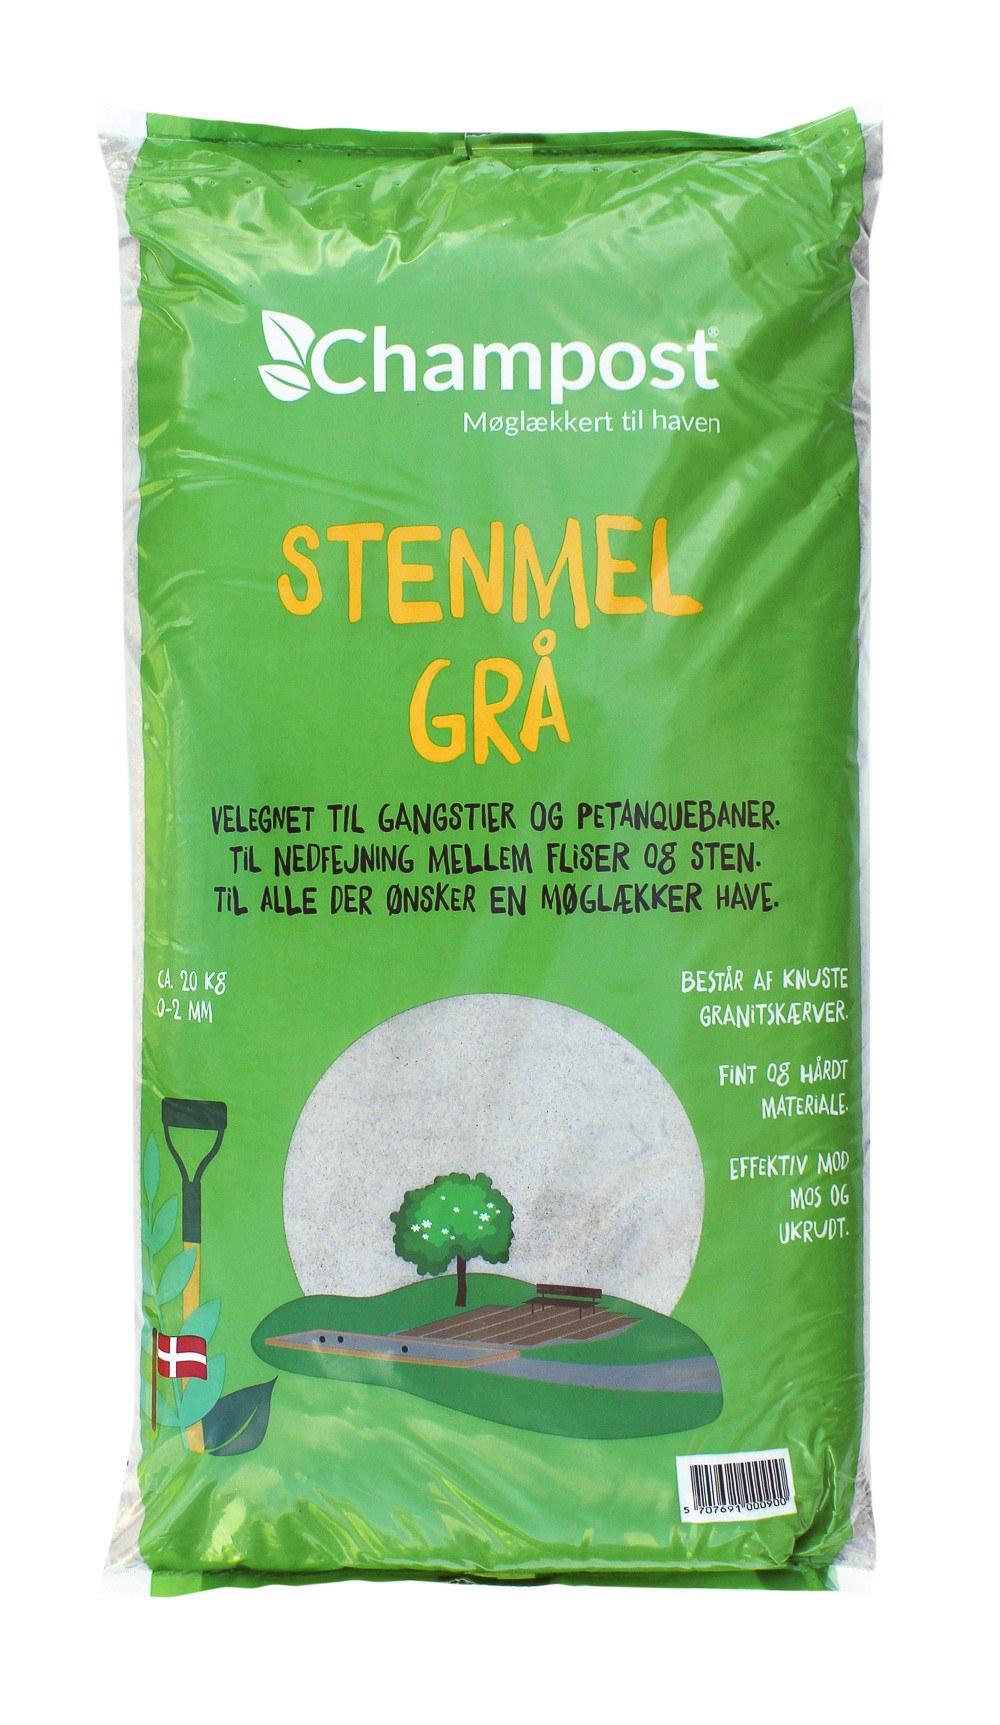 Champost Stenmel, 0-2 mm, 20 kg. sort eller grå